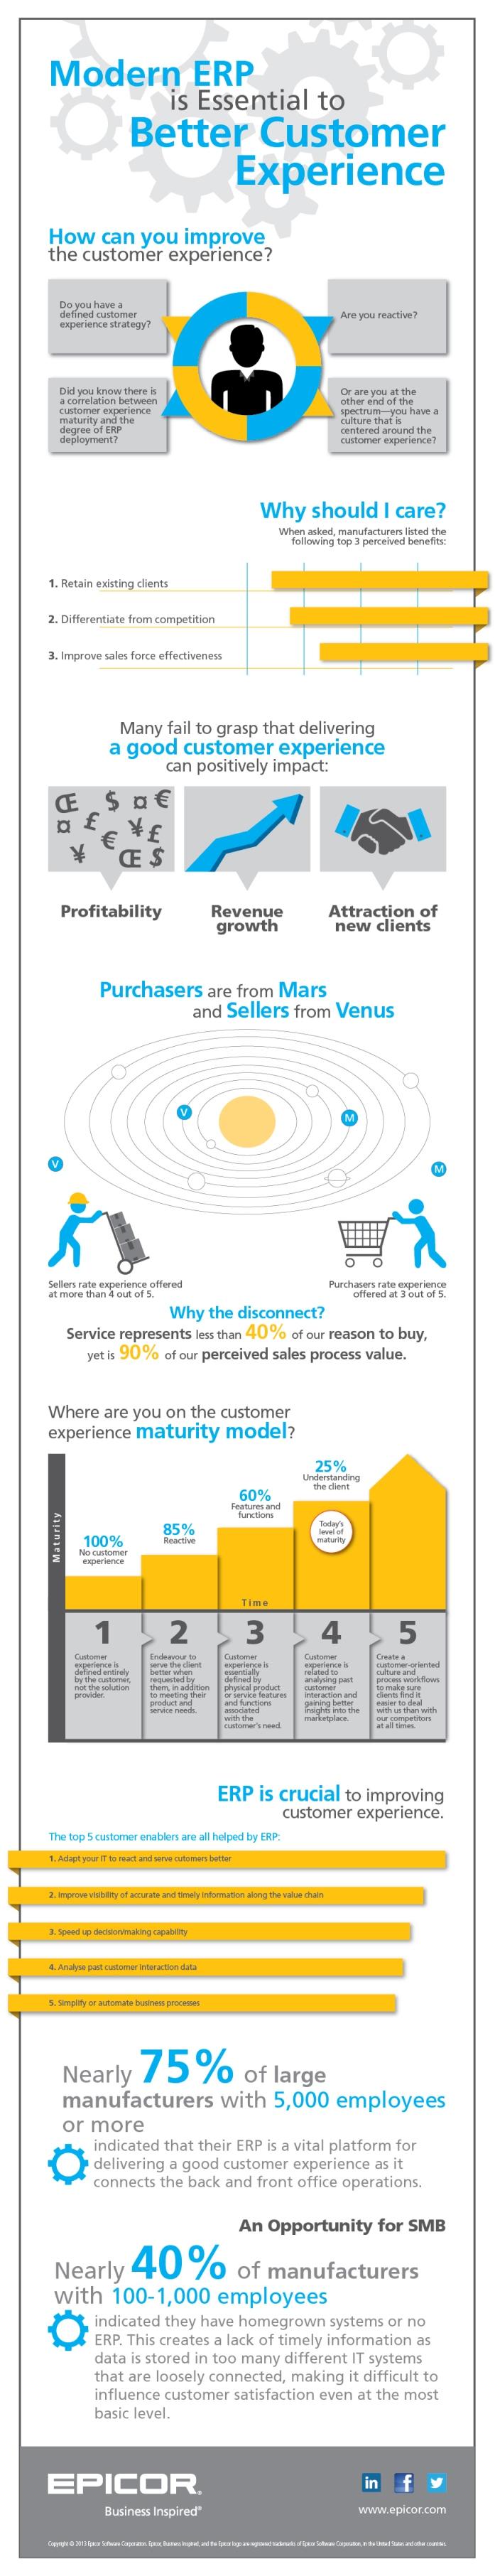 Epicor IDC Infographic Survey Small ENS 0713 2